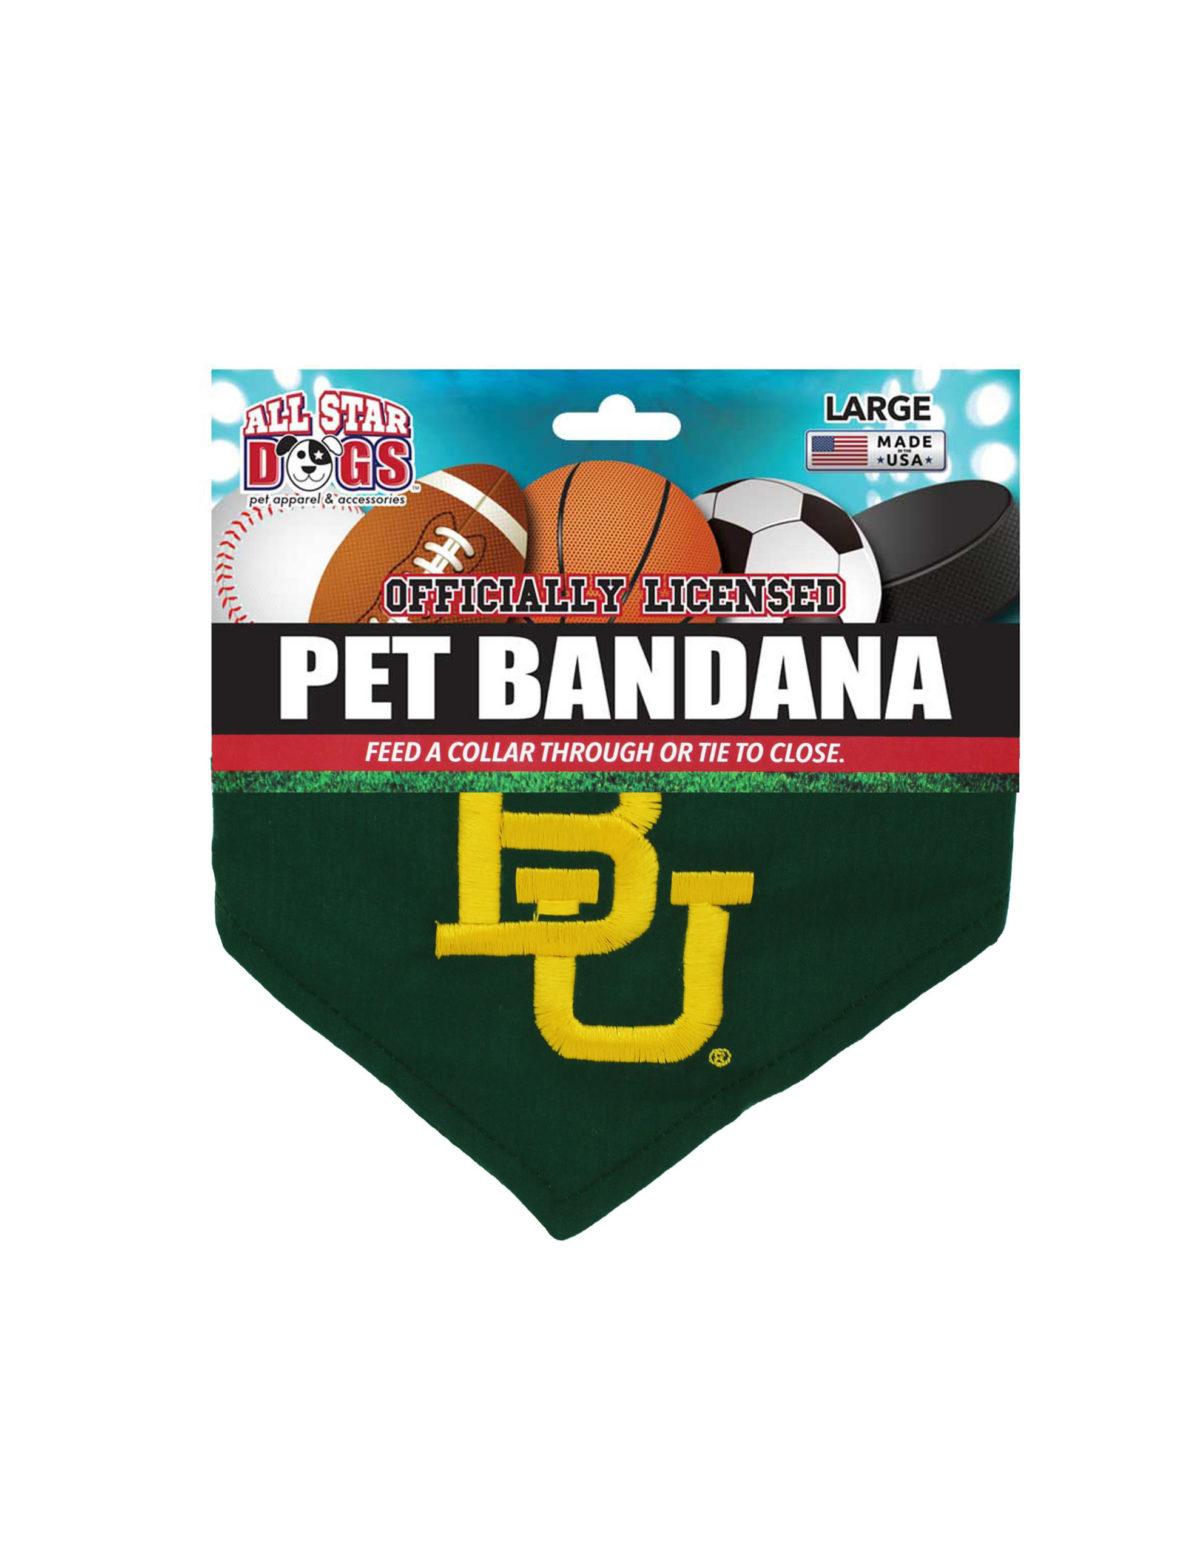 BU Baylor dog bandana Barefoot Campus Outfitter